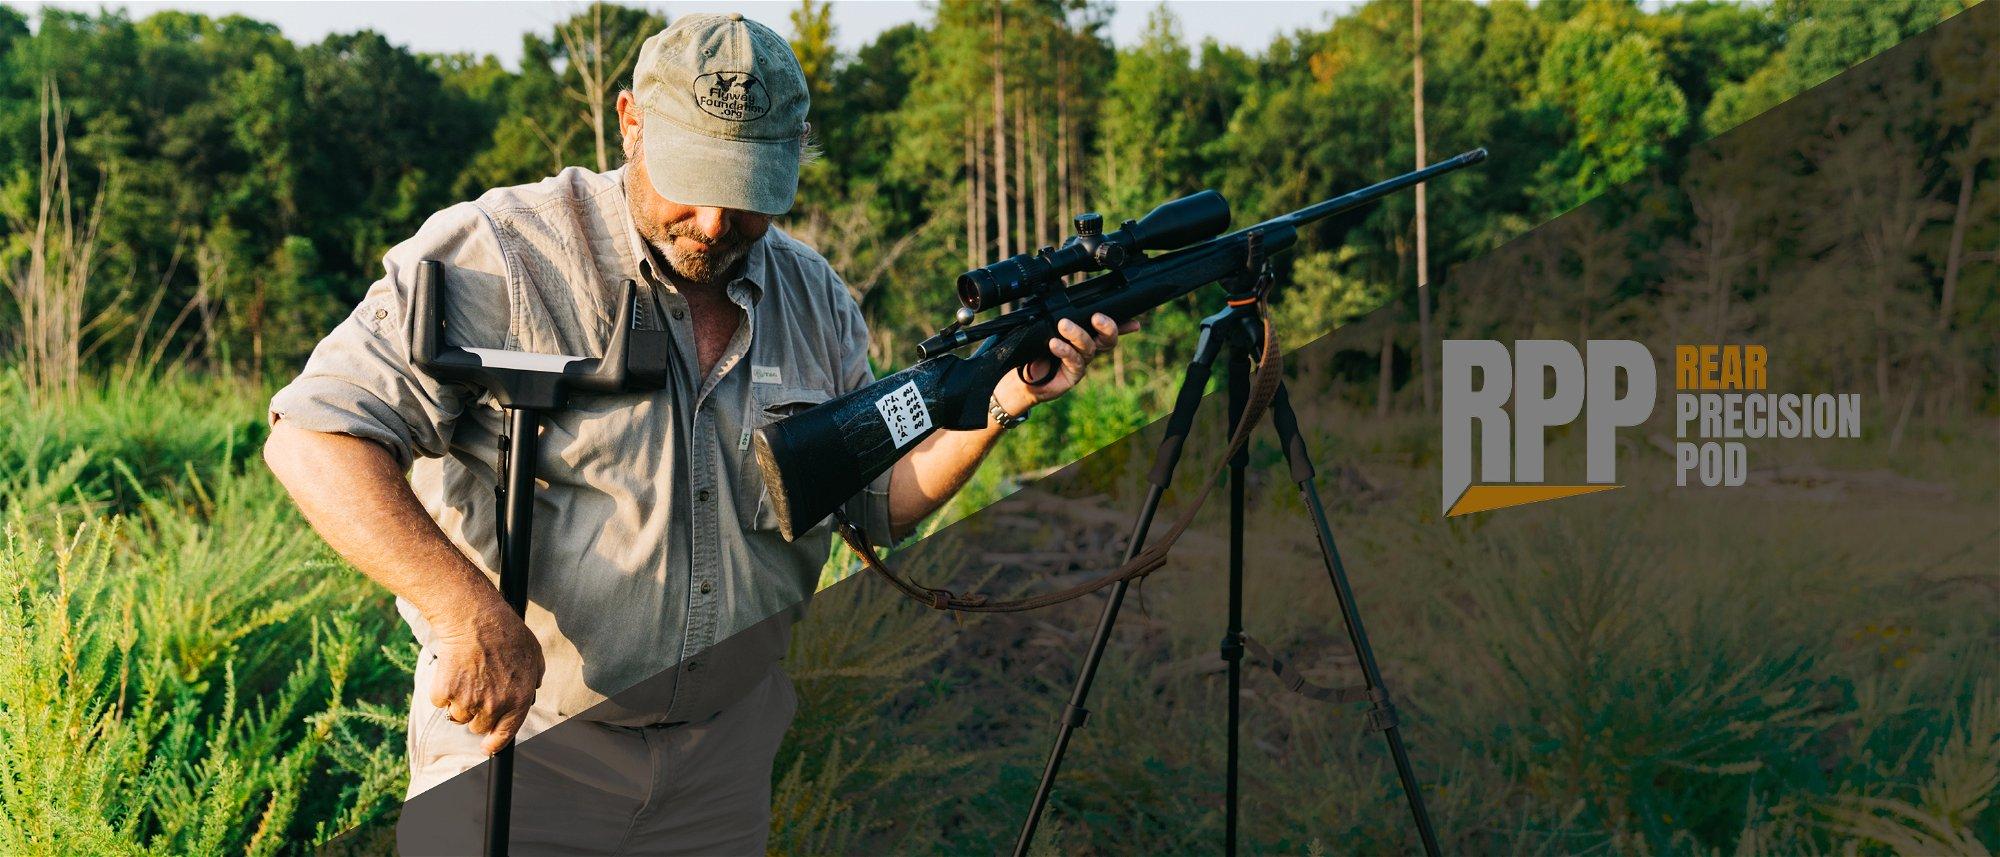 RPP - Rear Precision Pod gun stabilization system